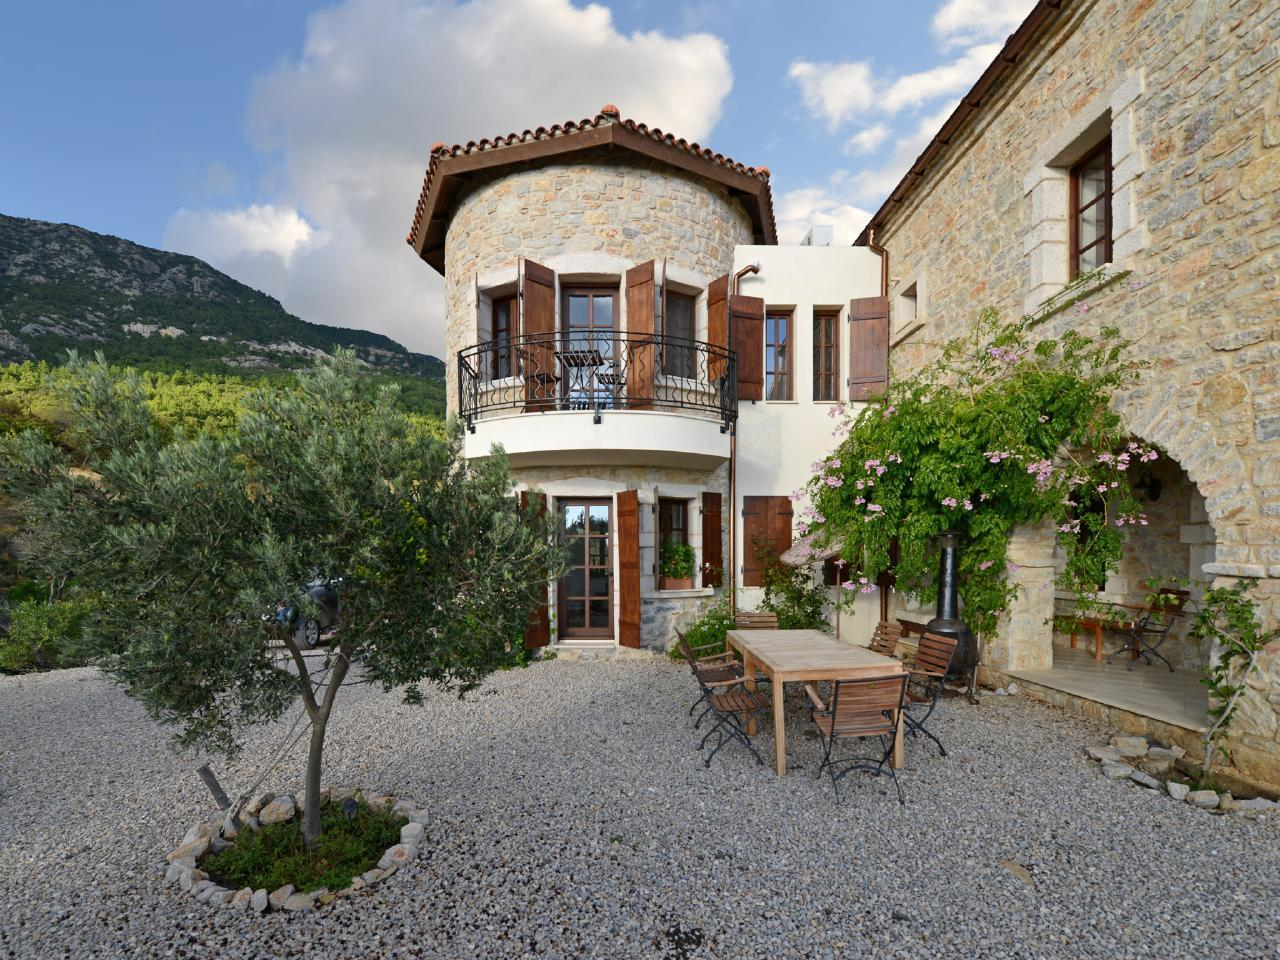 Maison de vacances Exklusives Chalet, romantisch am Berghang und Meer gelegen (2506674), Mesudiye, , Région Egéenne, Turquie, image 4